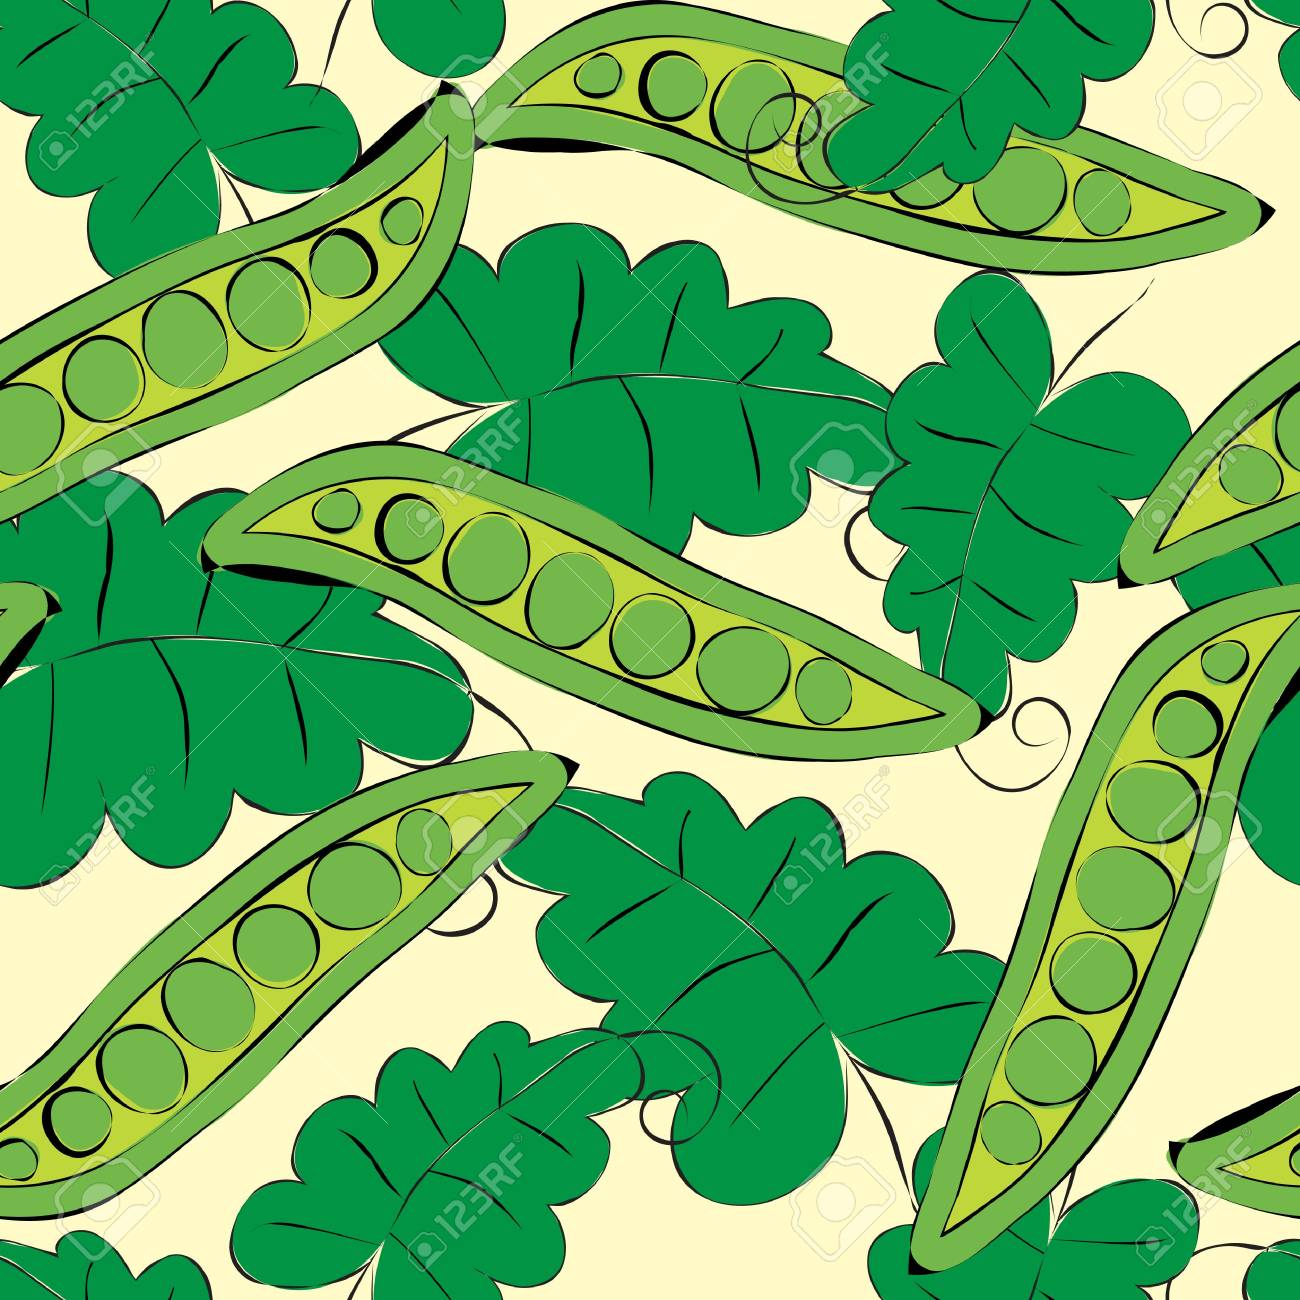 Pea pod seamless green pattern Stock Vector - 9495080